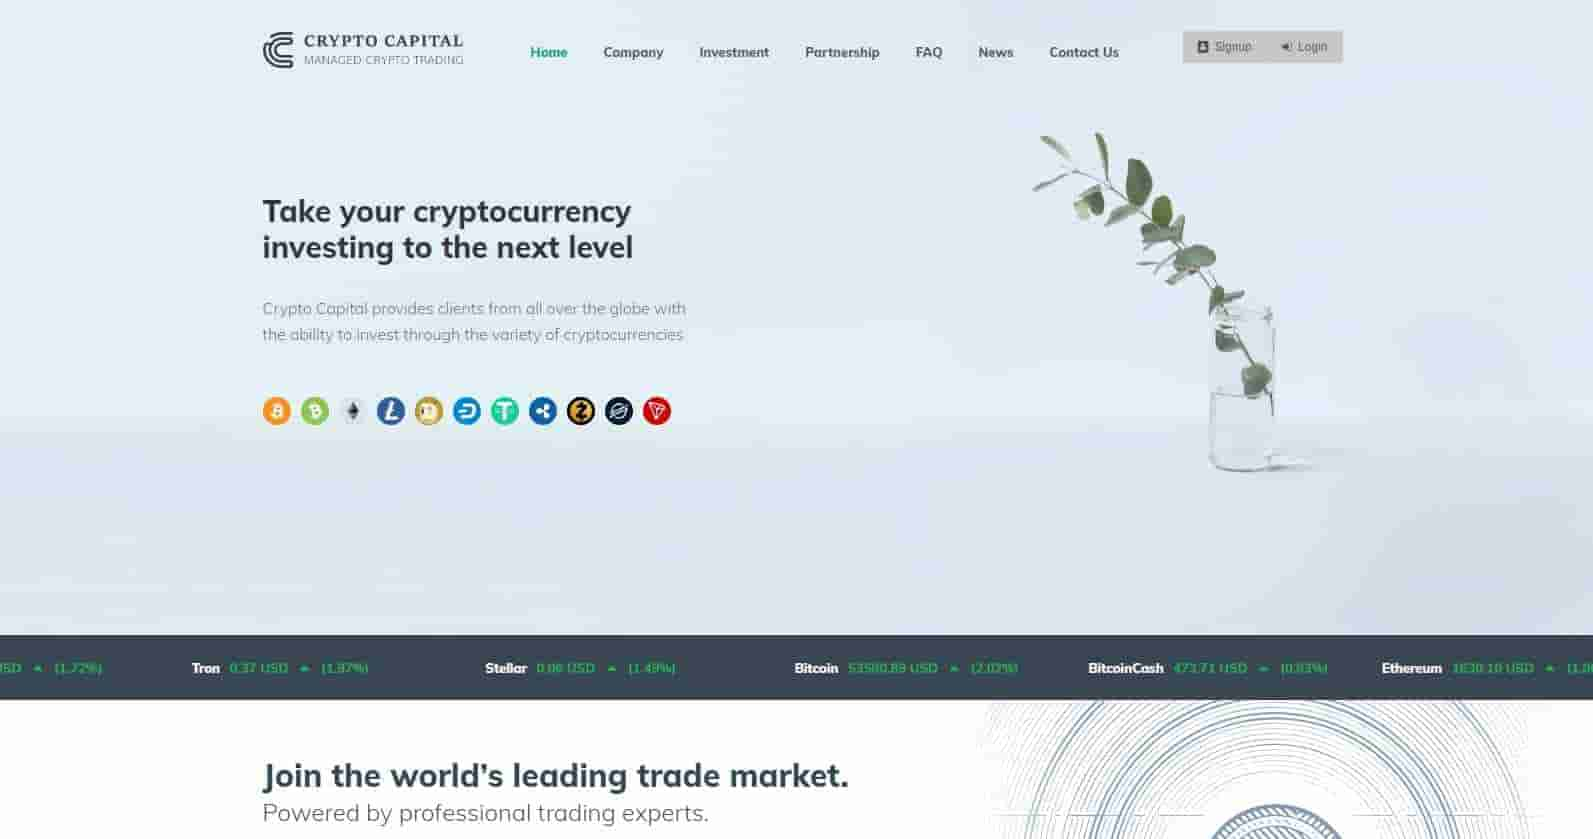 CryptoCapital